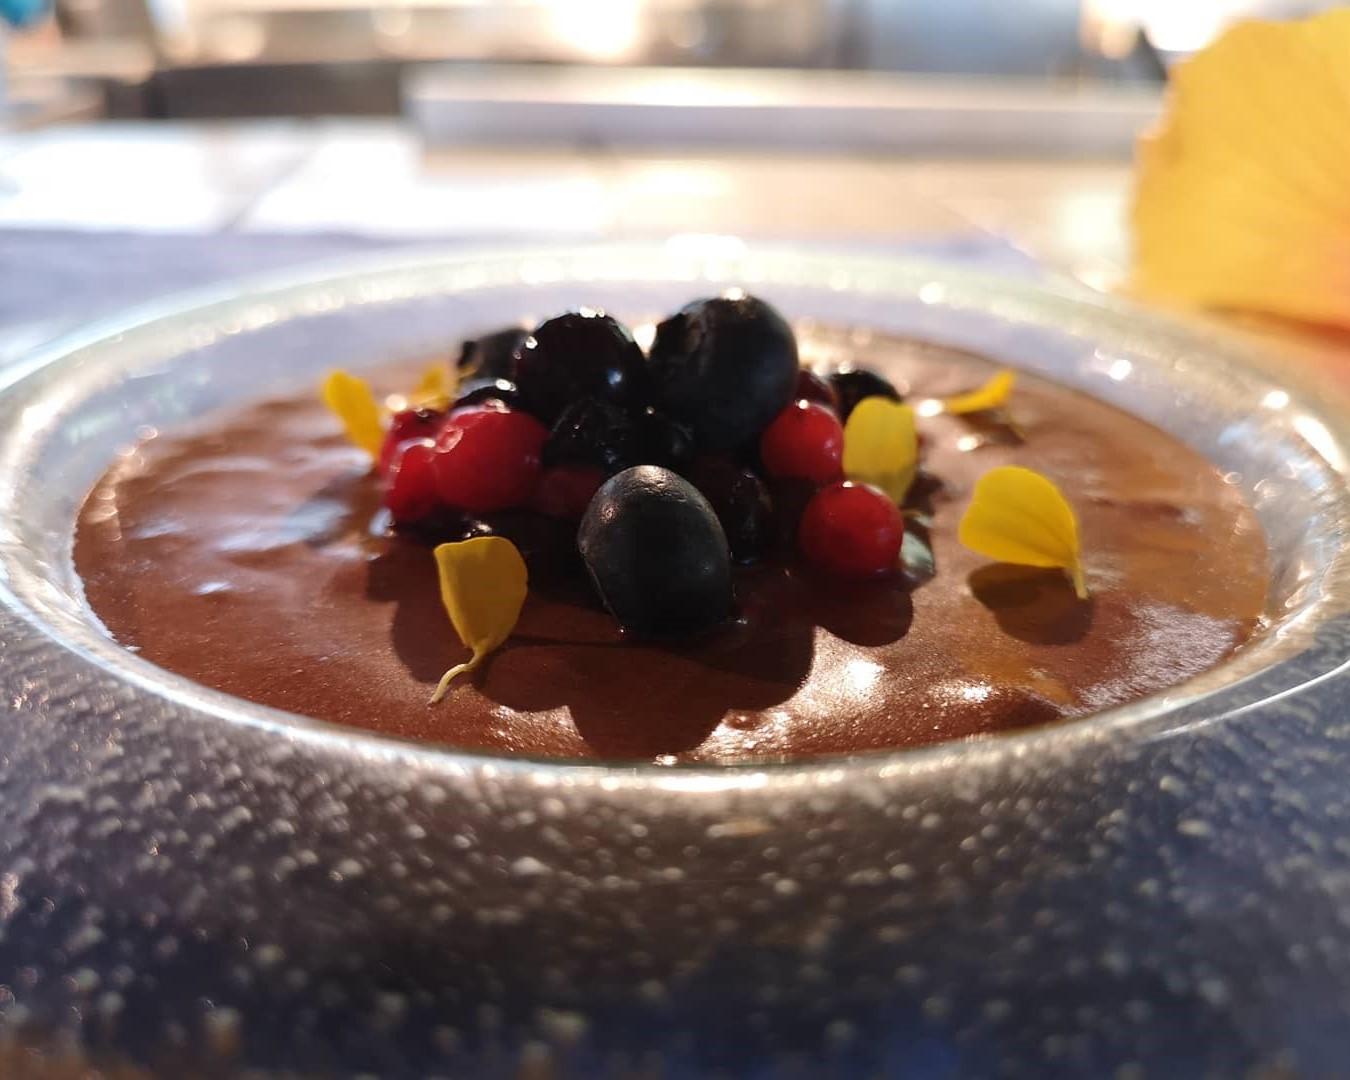 mesa-habla-postre-mousse-chocolate-frutos-rojos-jardin-tecina